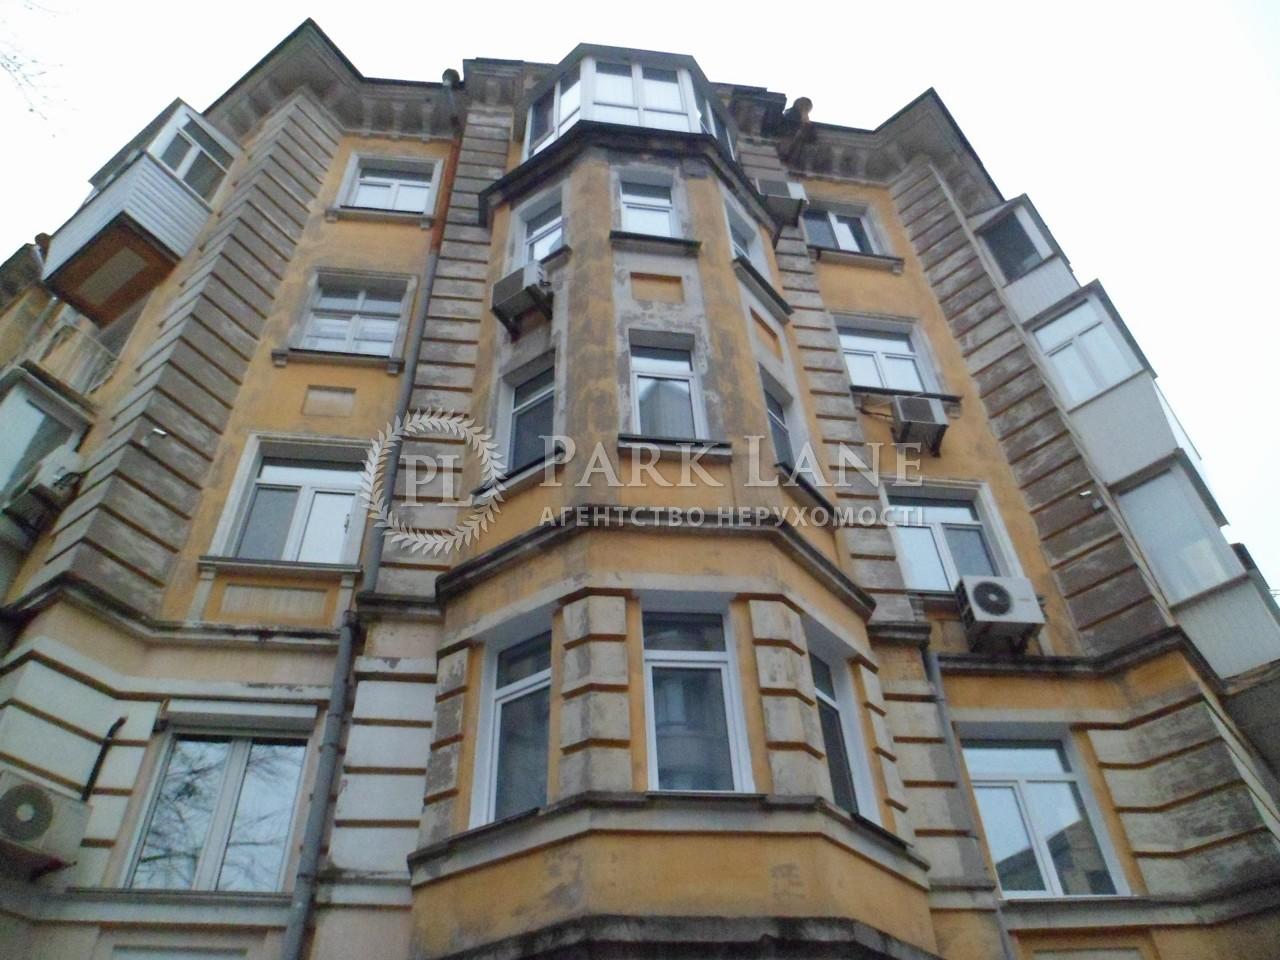 Квартира вул. Шовковична, 18б, Київ, Z-1075191 - Фото 1